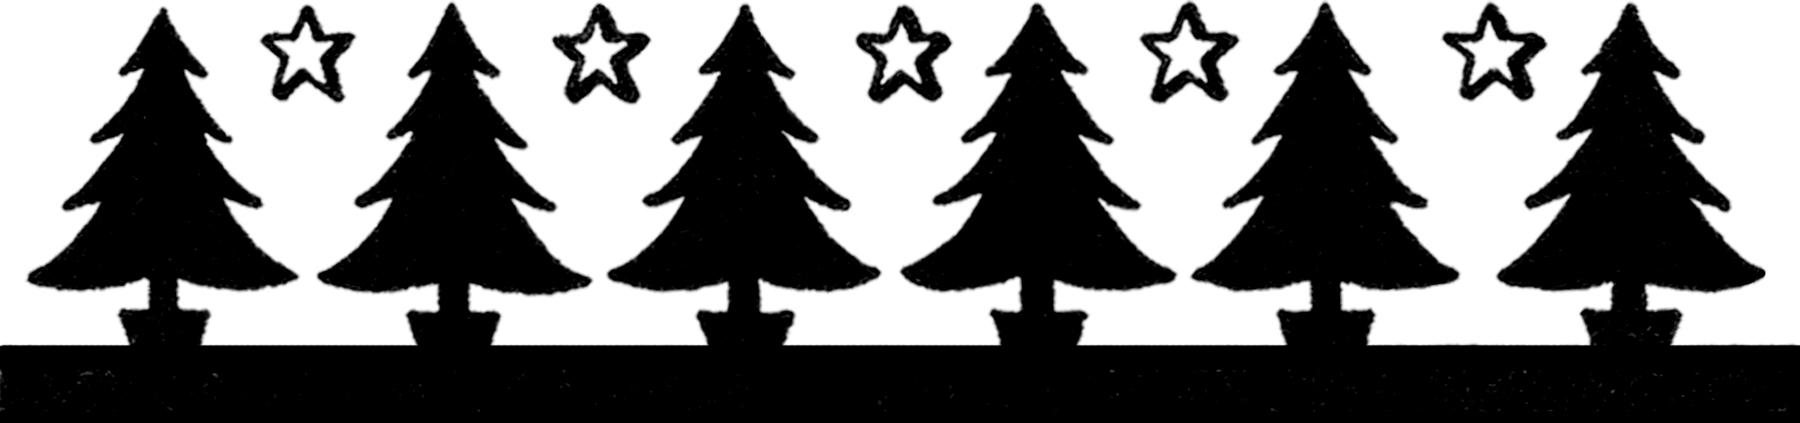 Christmas Tree Silhouette Border Image